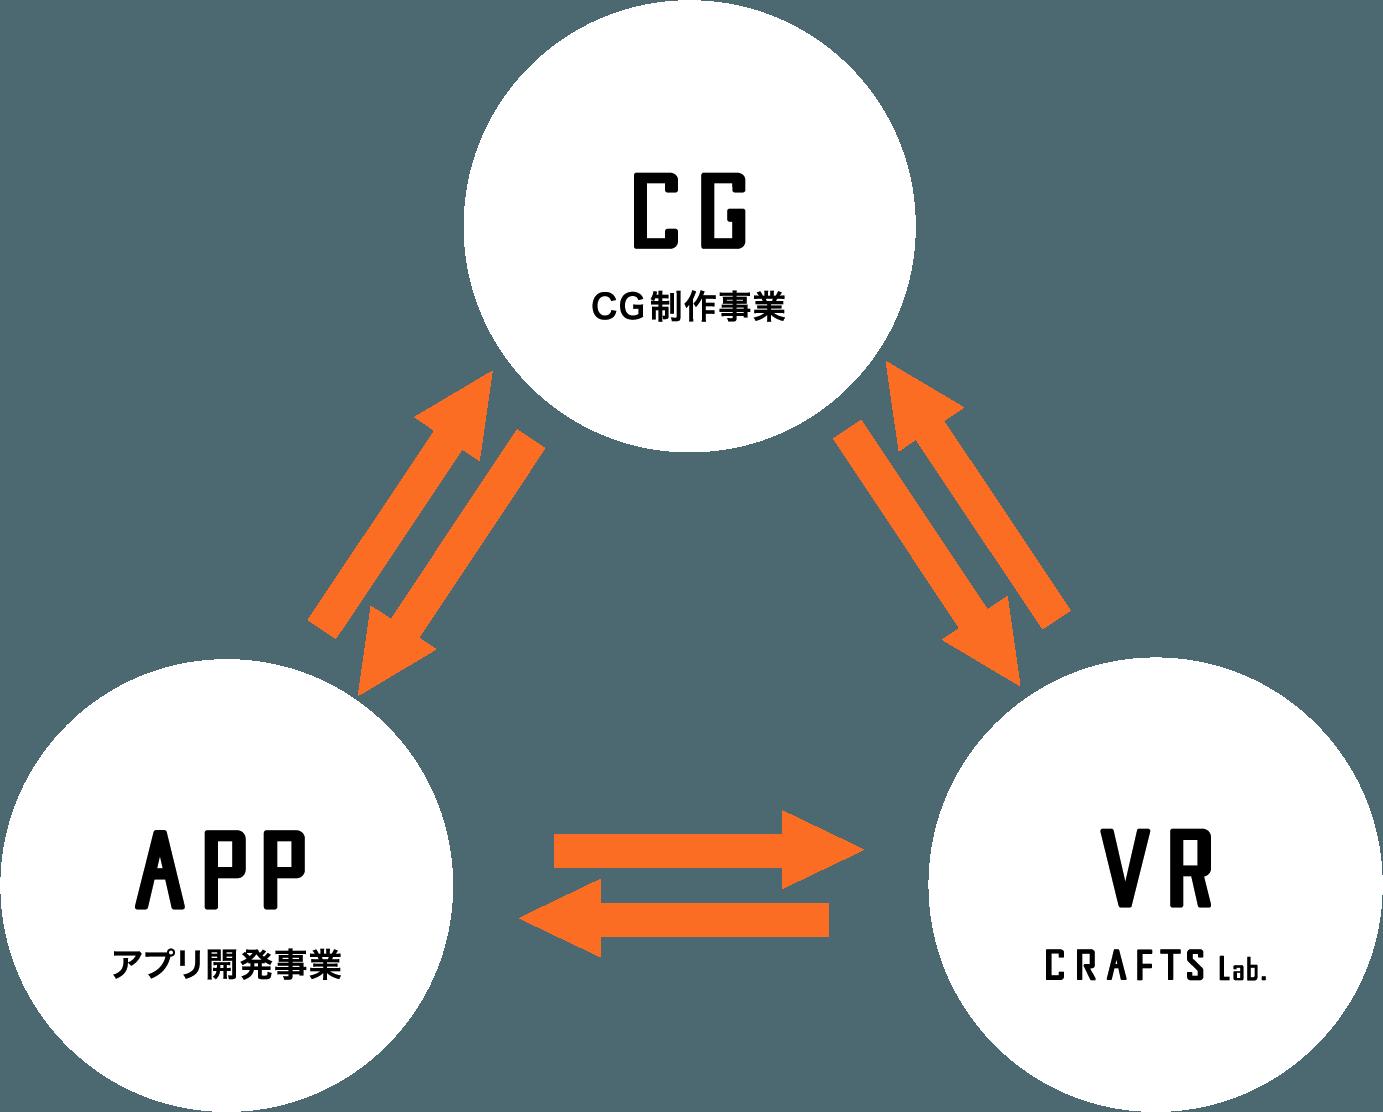 Service circle image